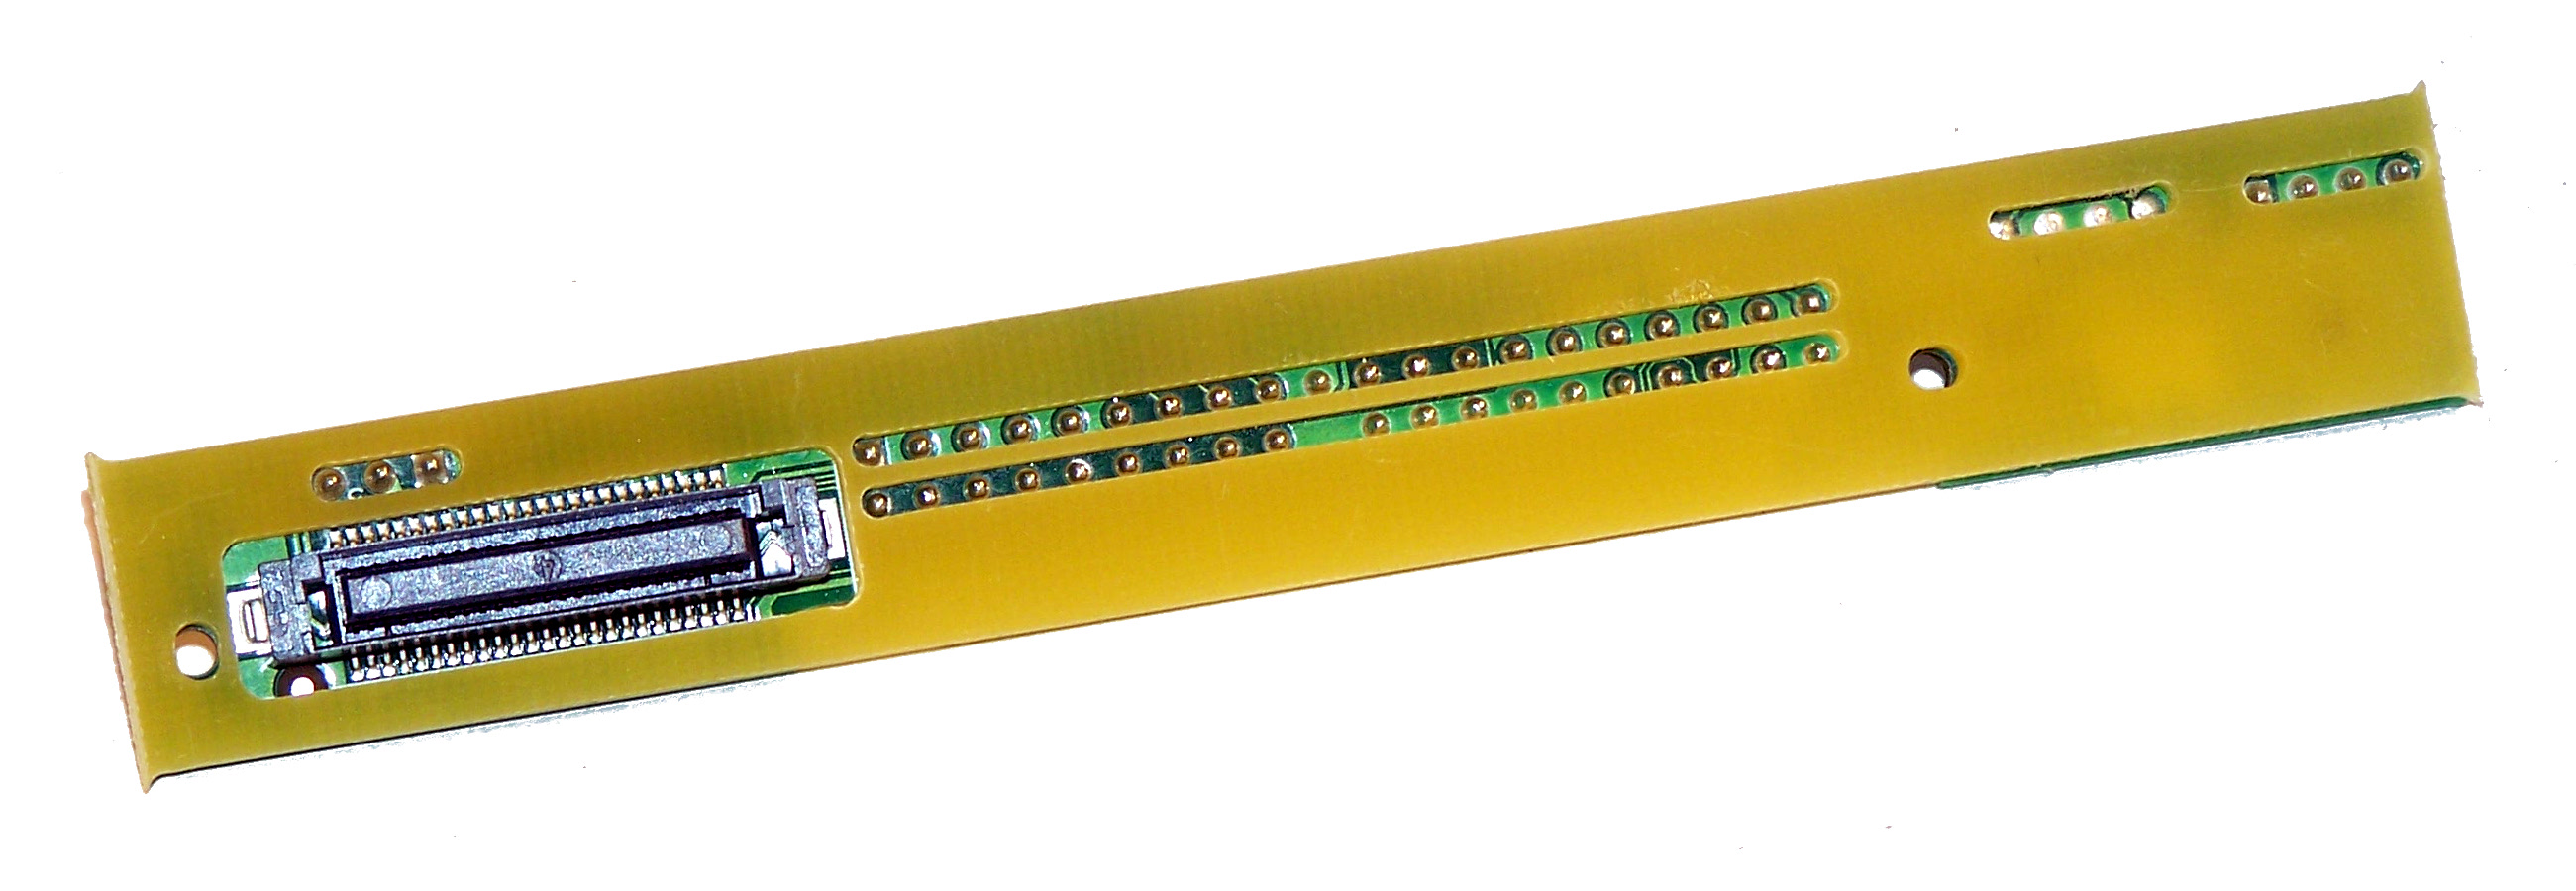 Asus slim ide ide 40 pin to jae 50 pin slimline odd adapter board ...